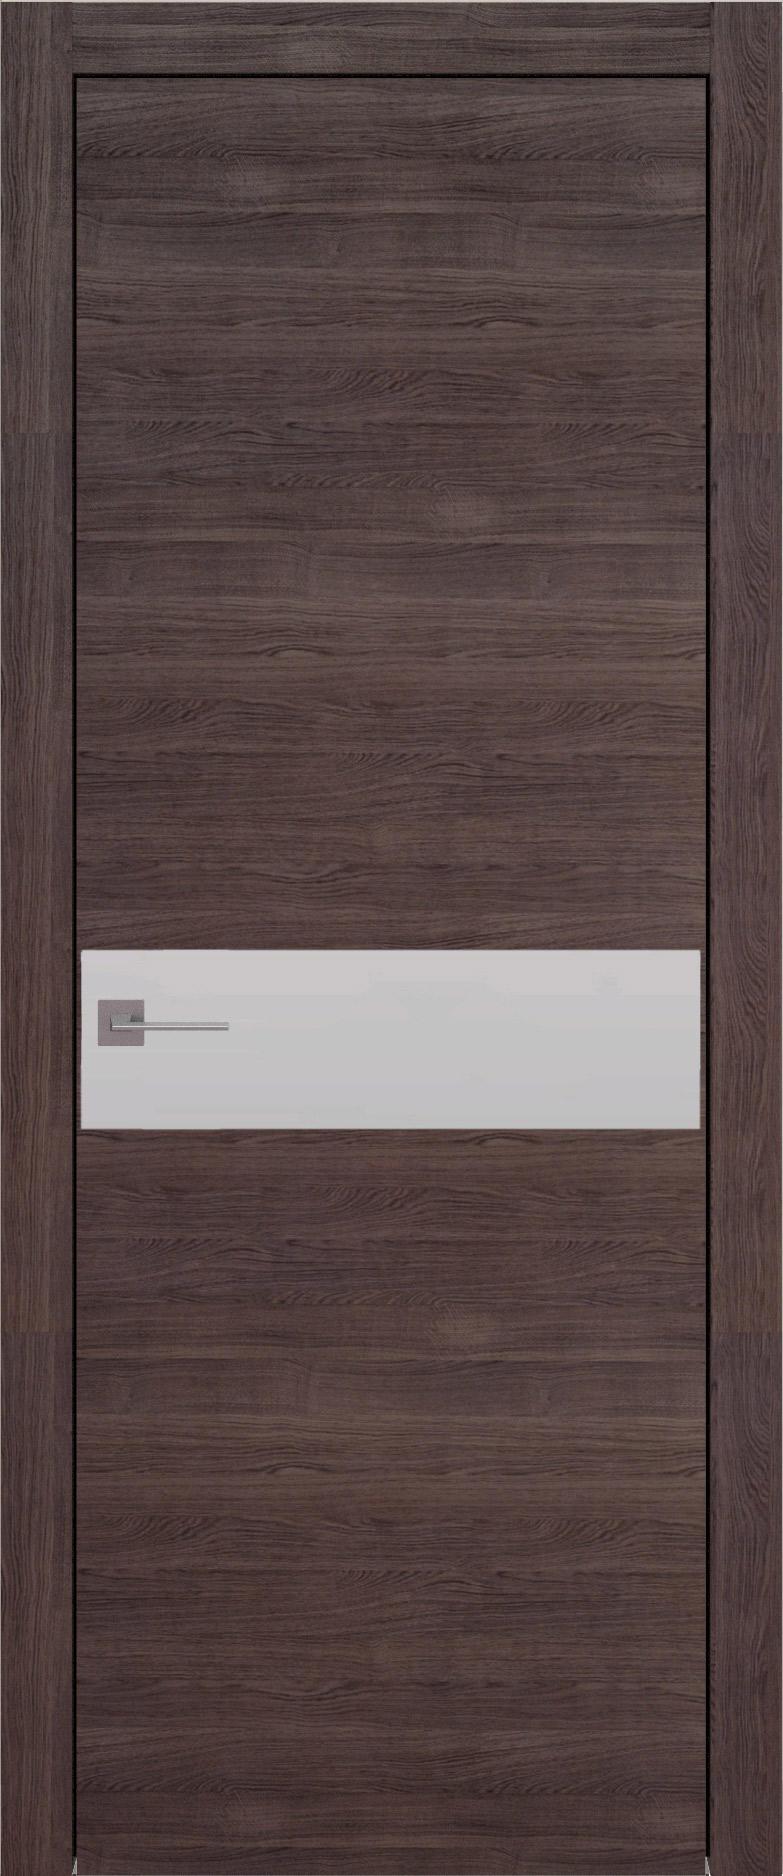 Tivoli И-4 цвет - Венге Нуар Без стекла (ДГ)